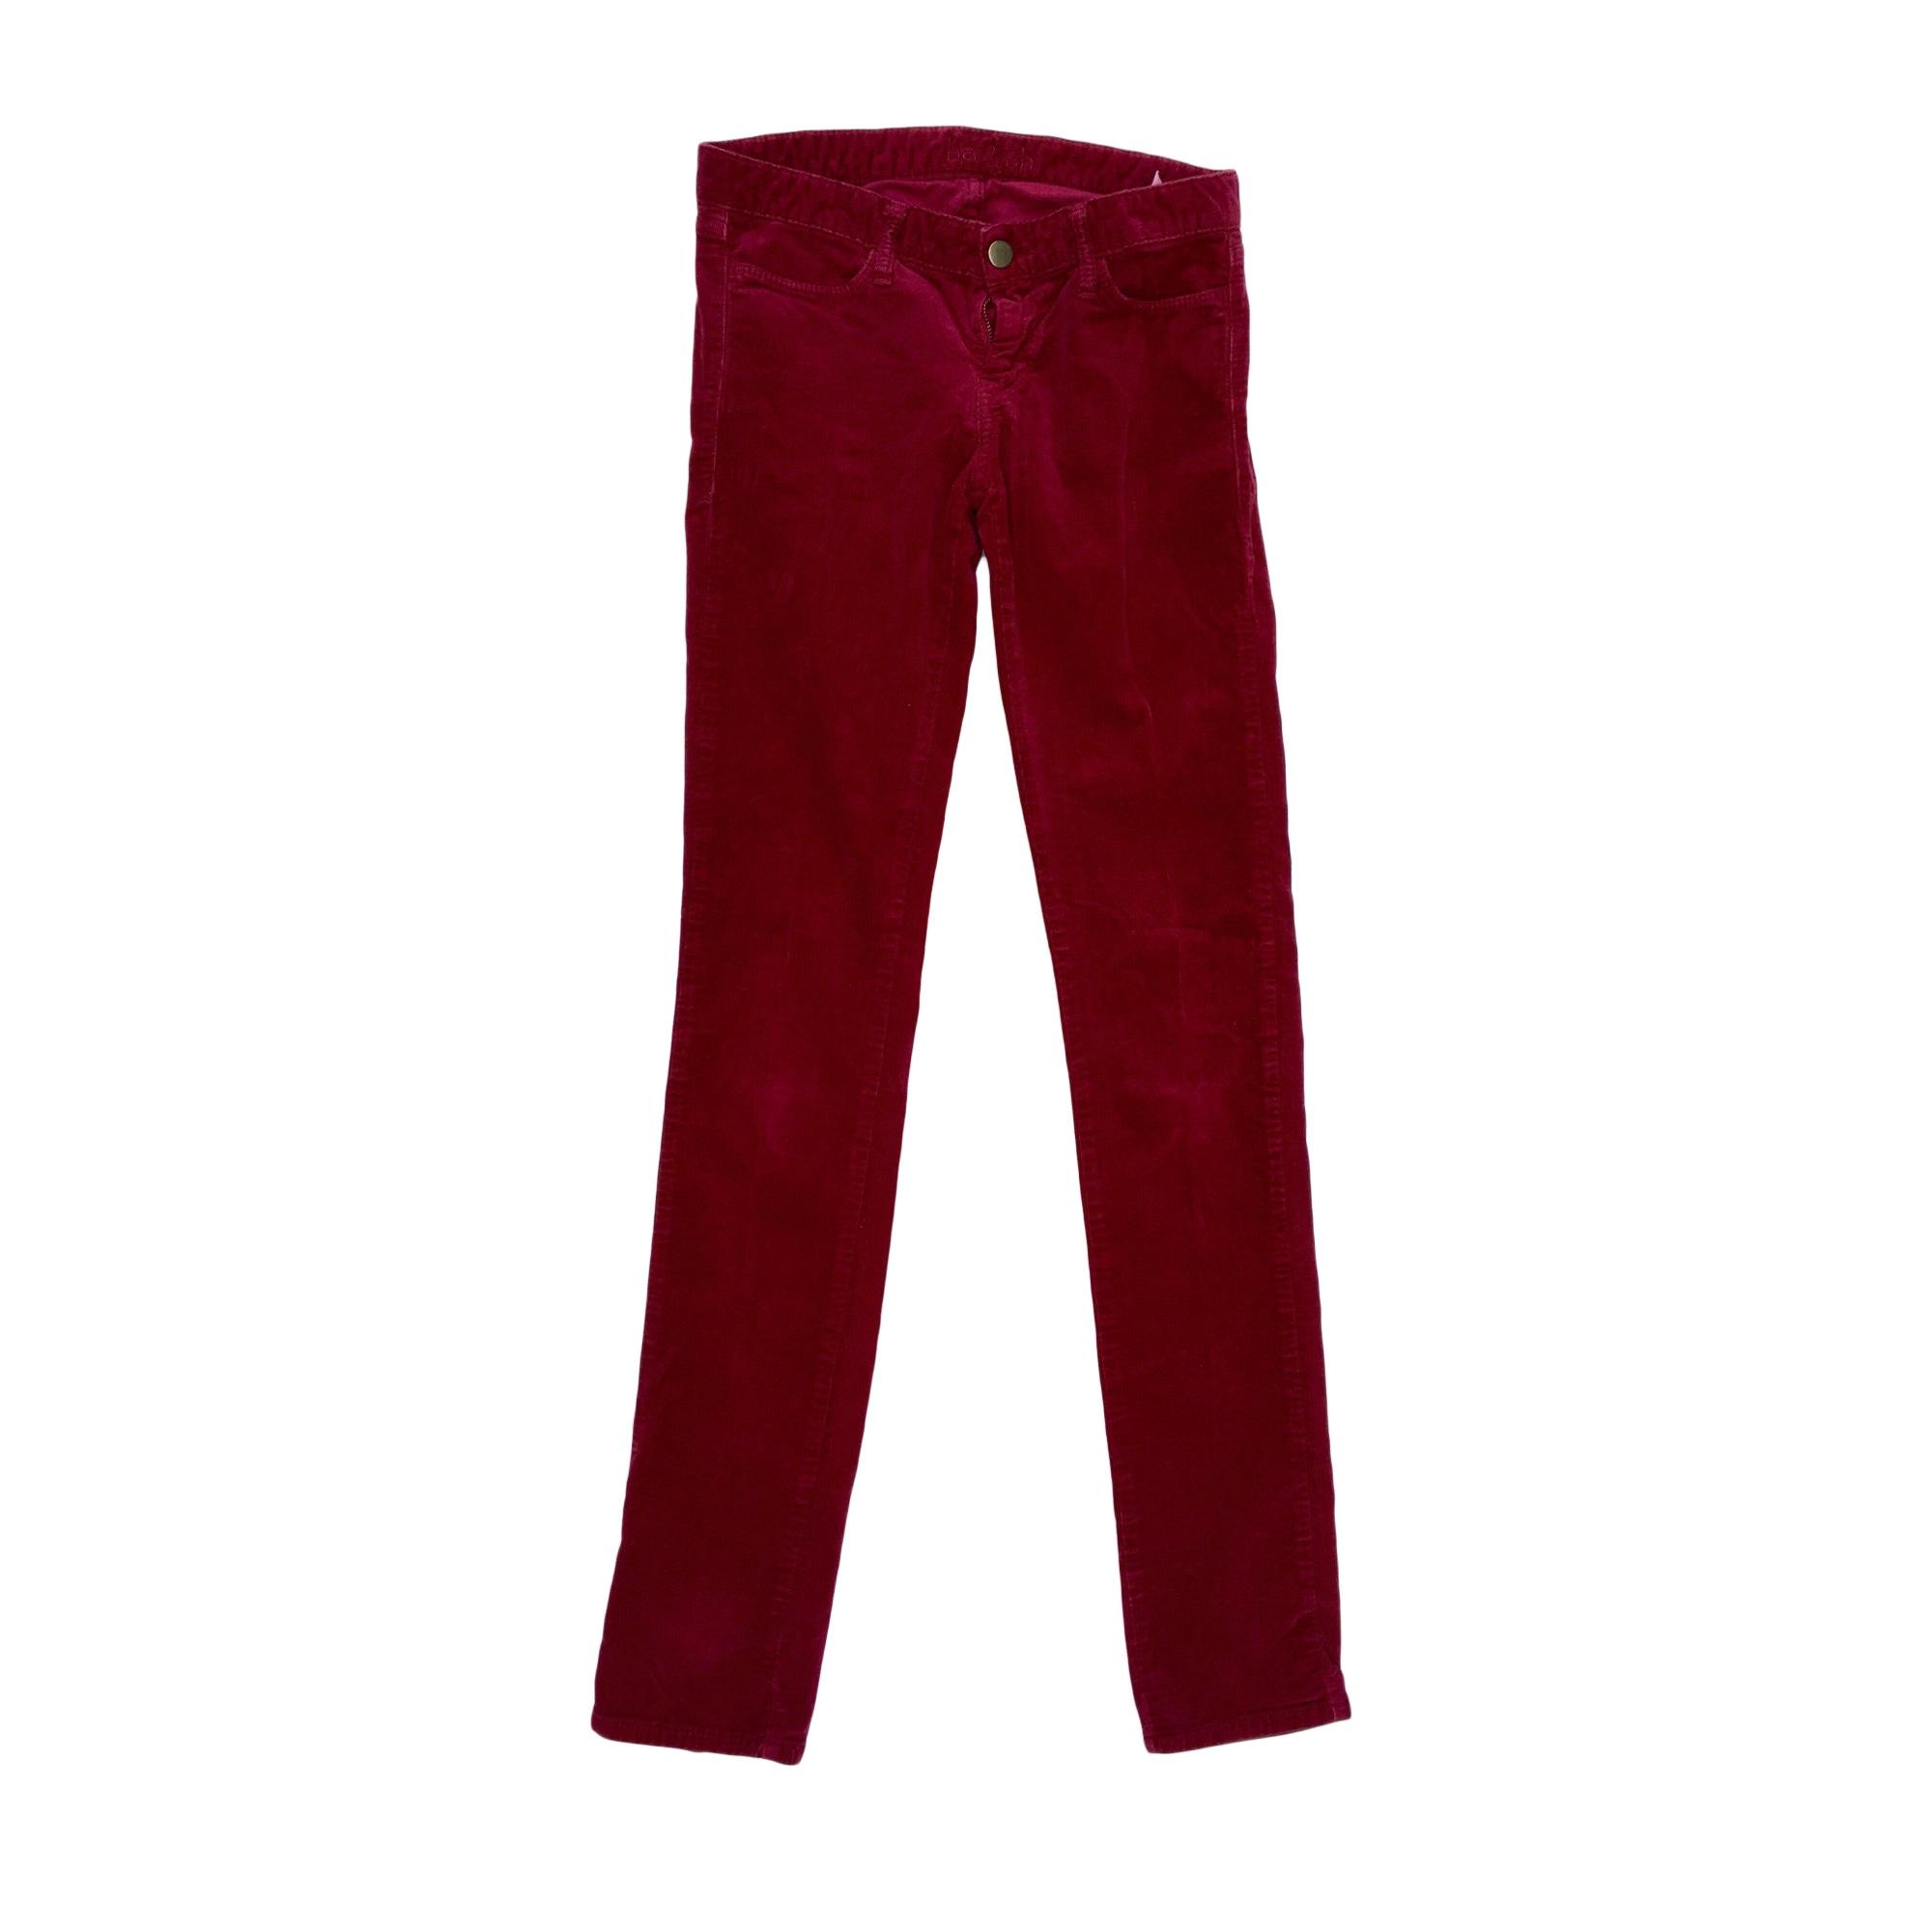 Pantalon slim, cigarette BA&SH Rouge, bordeaux